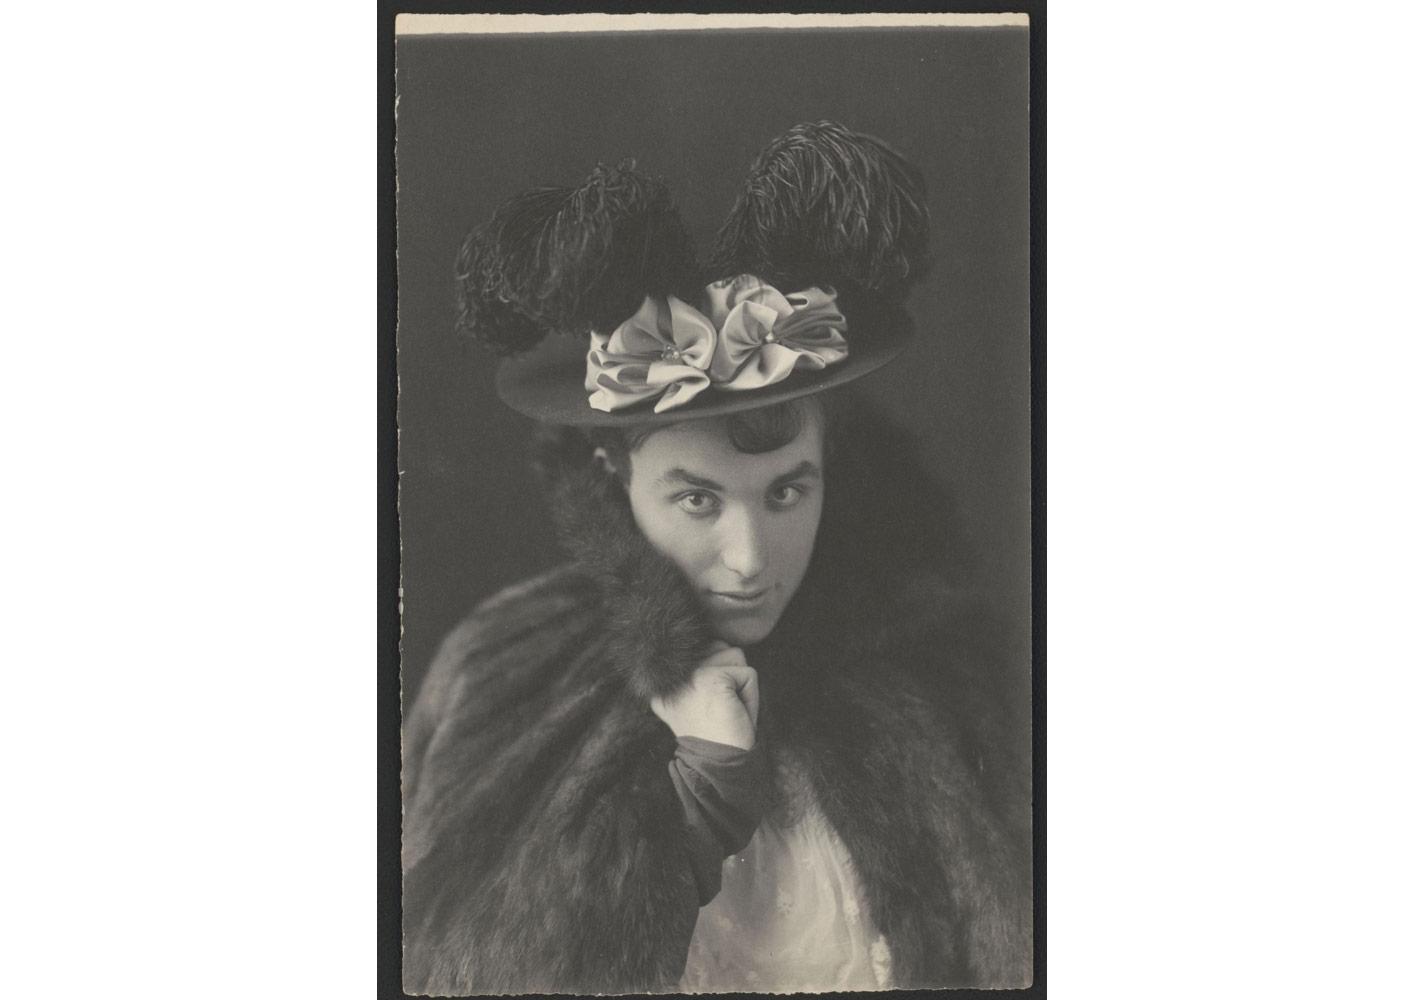 Frances Benjamin Johnston (1864-1952), Mills Thompson travesti kılığında, yaklaşık 1895 © Library of Congress, Prints & Photographs Division [LC-DIG-ppmsca-38987]